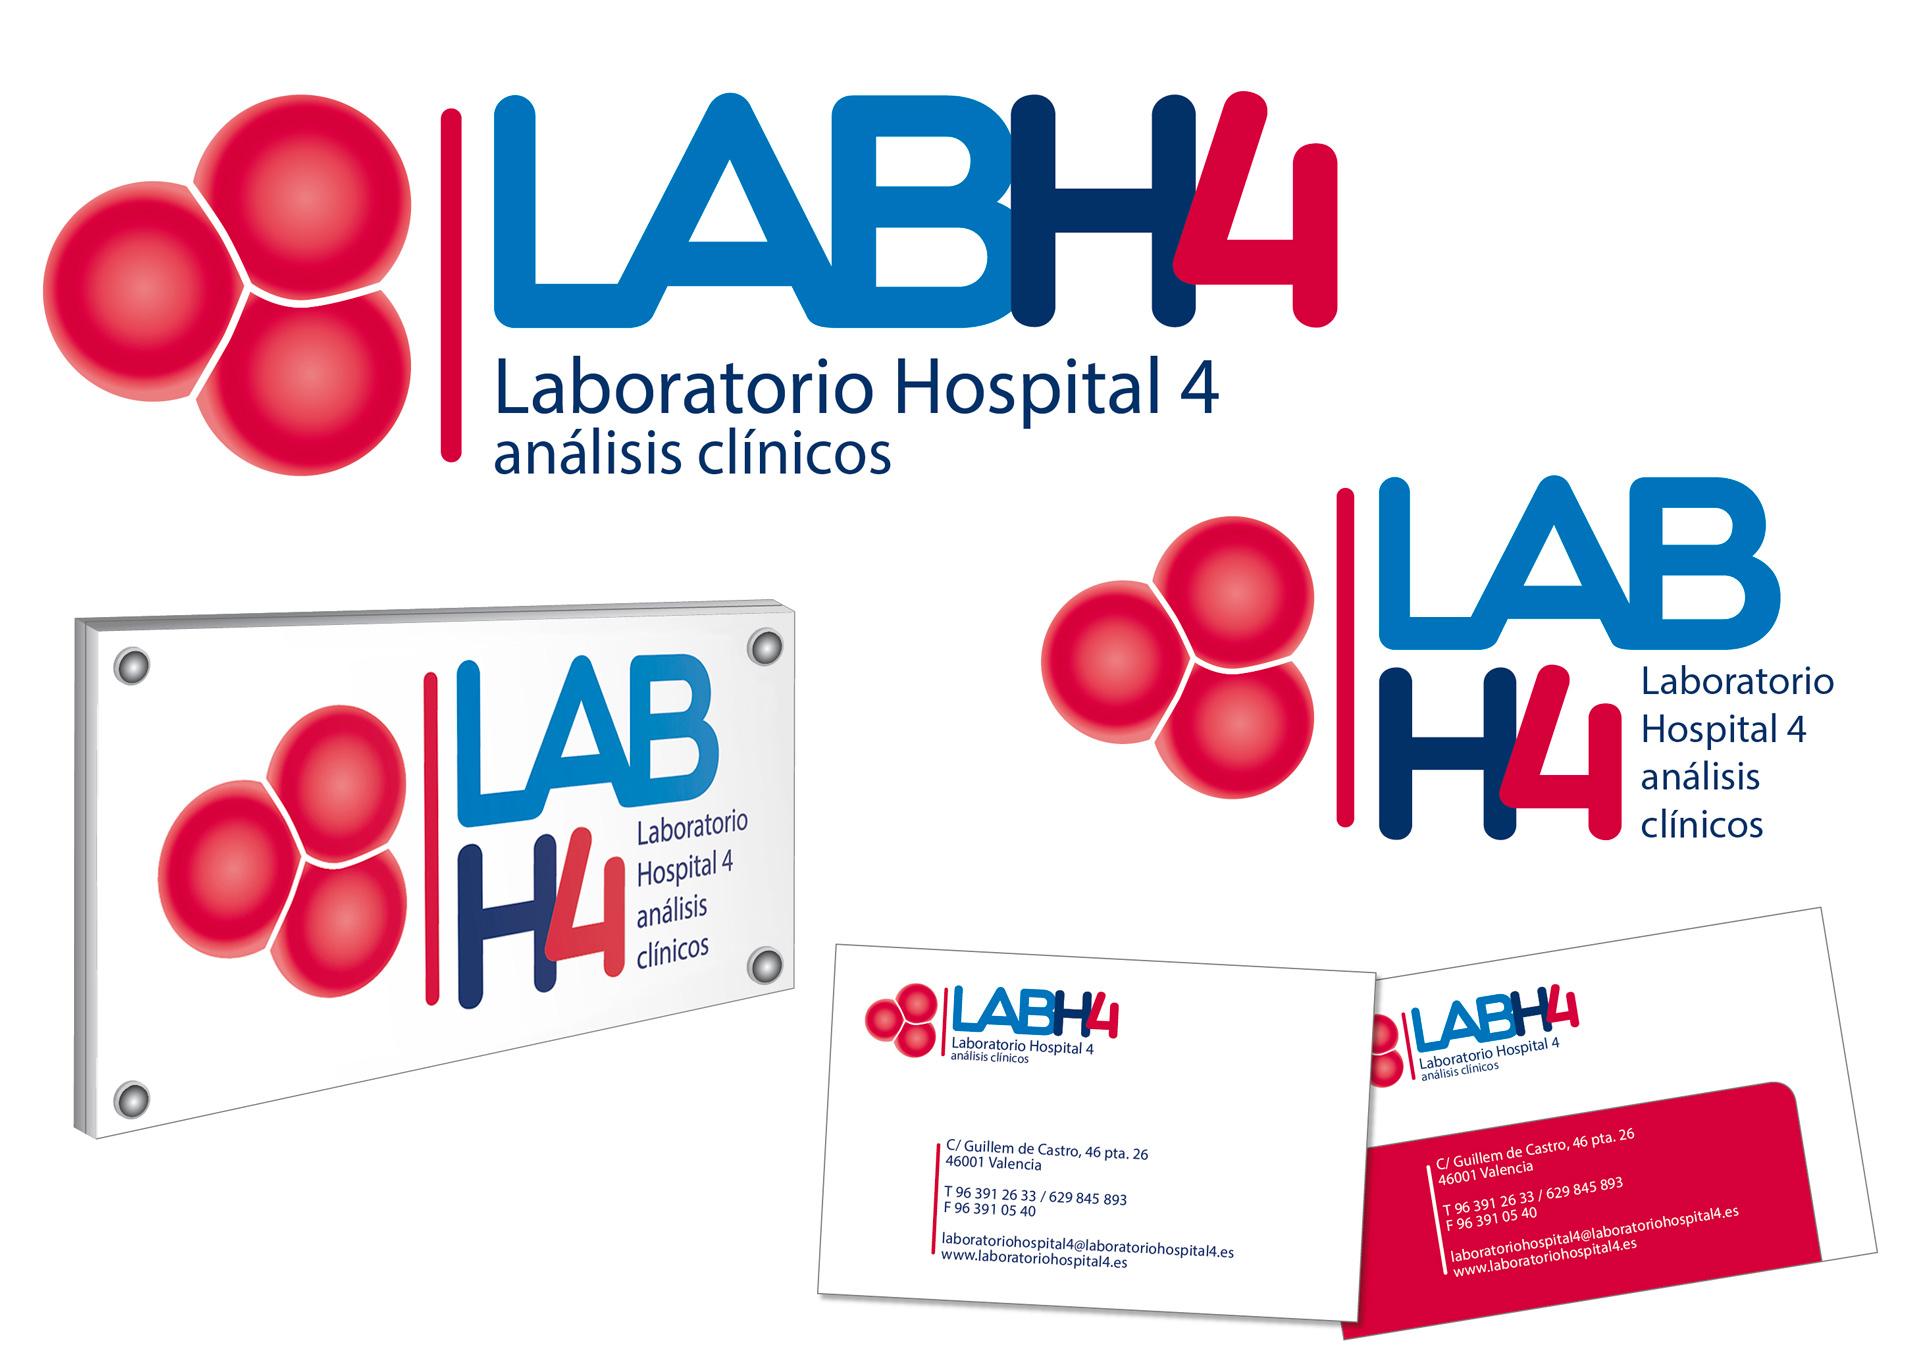 LABH4